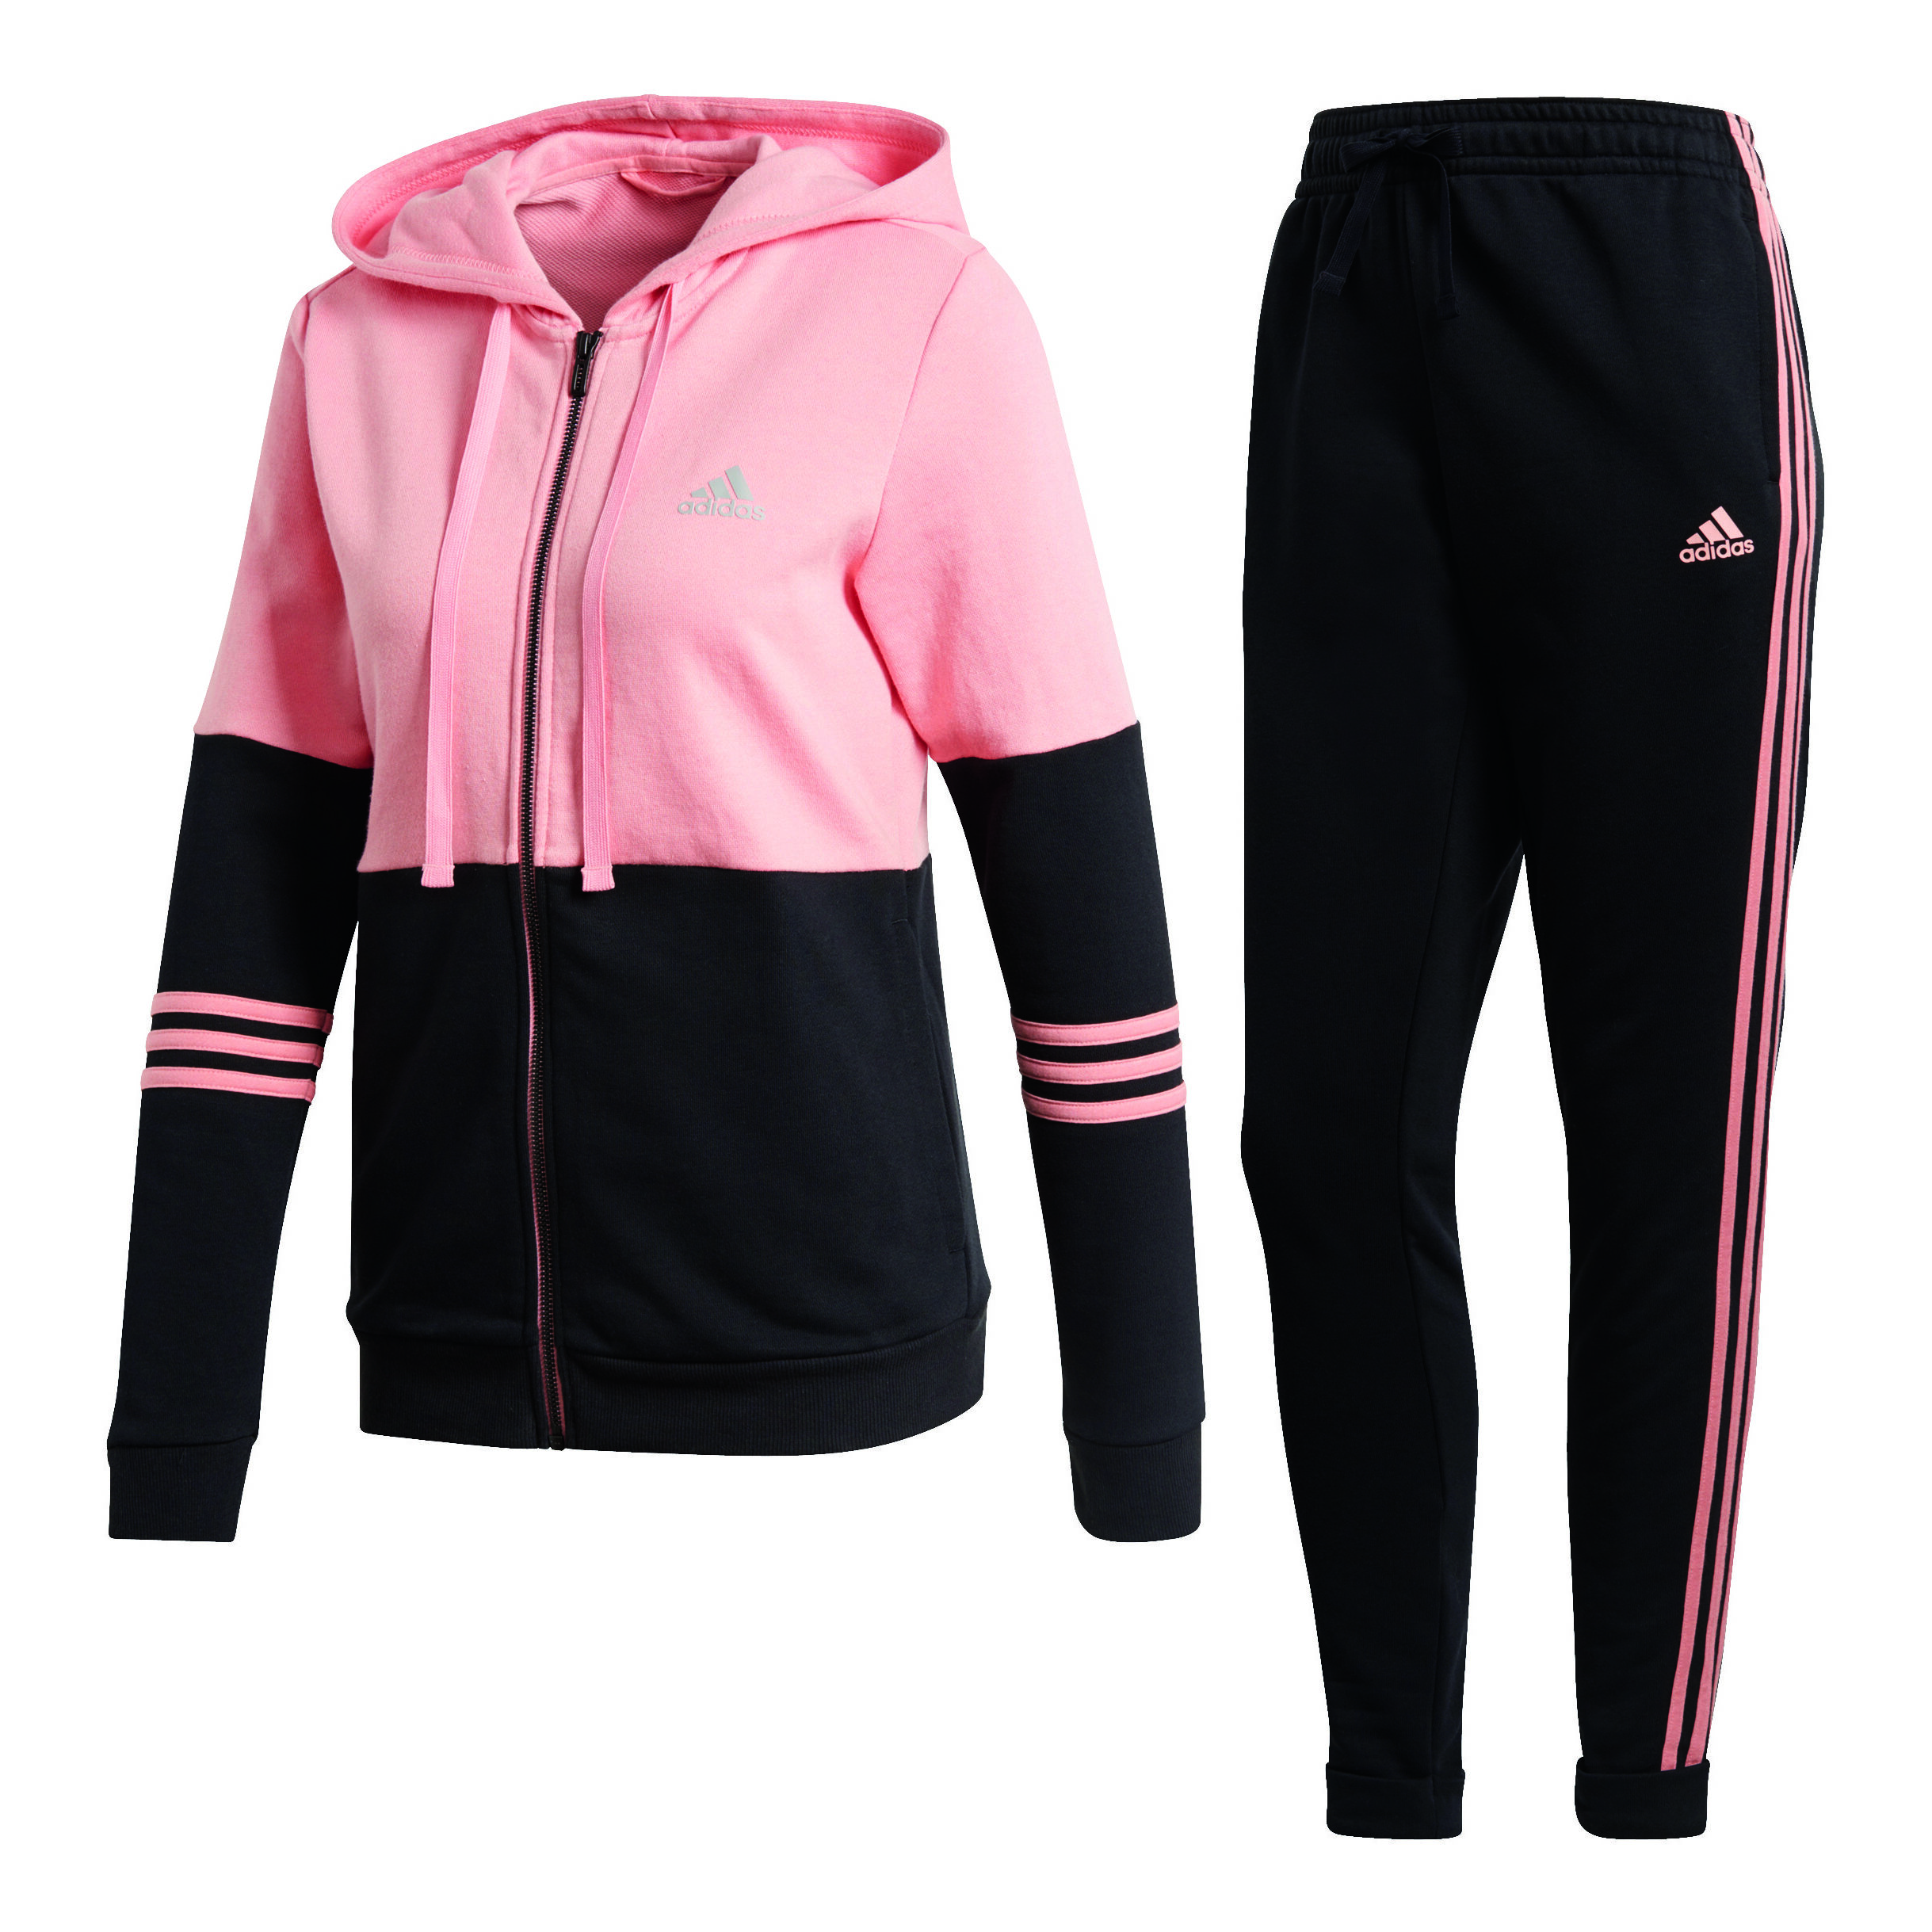 adidas Co Energize Trainingsanzug Damen Rosa, Schwarz